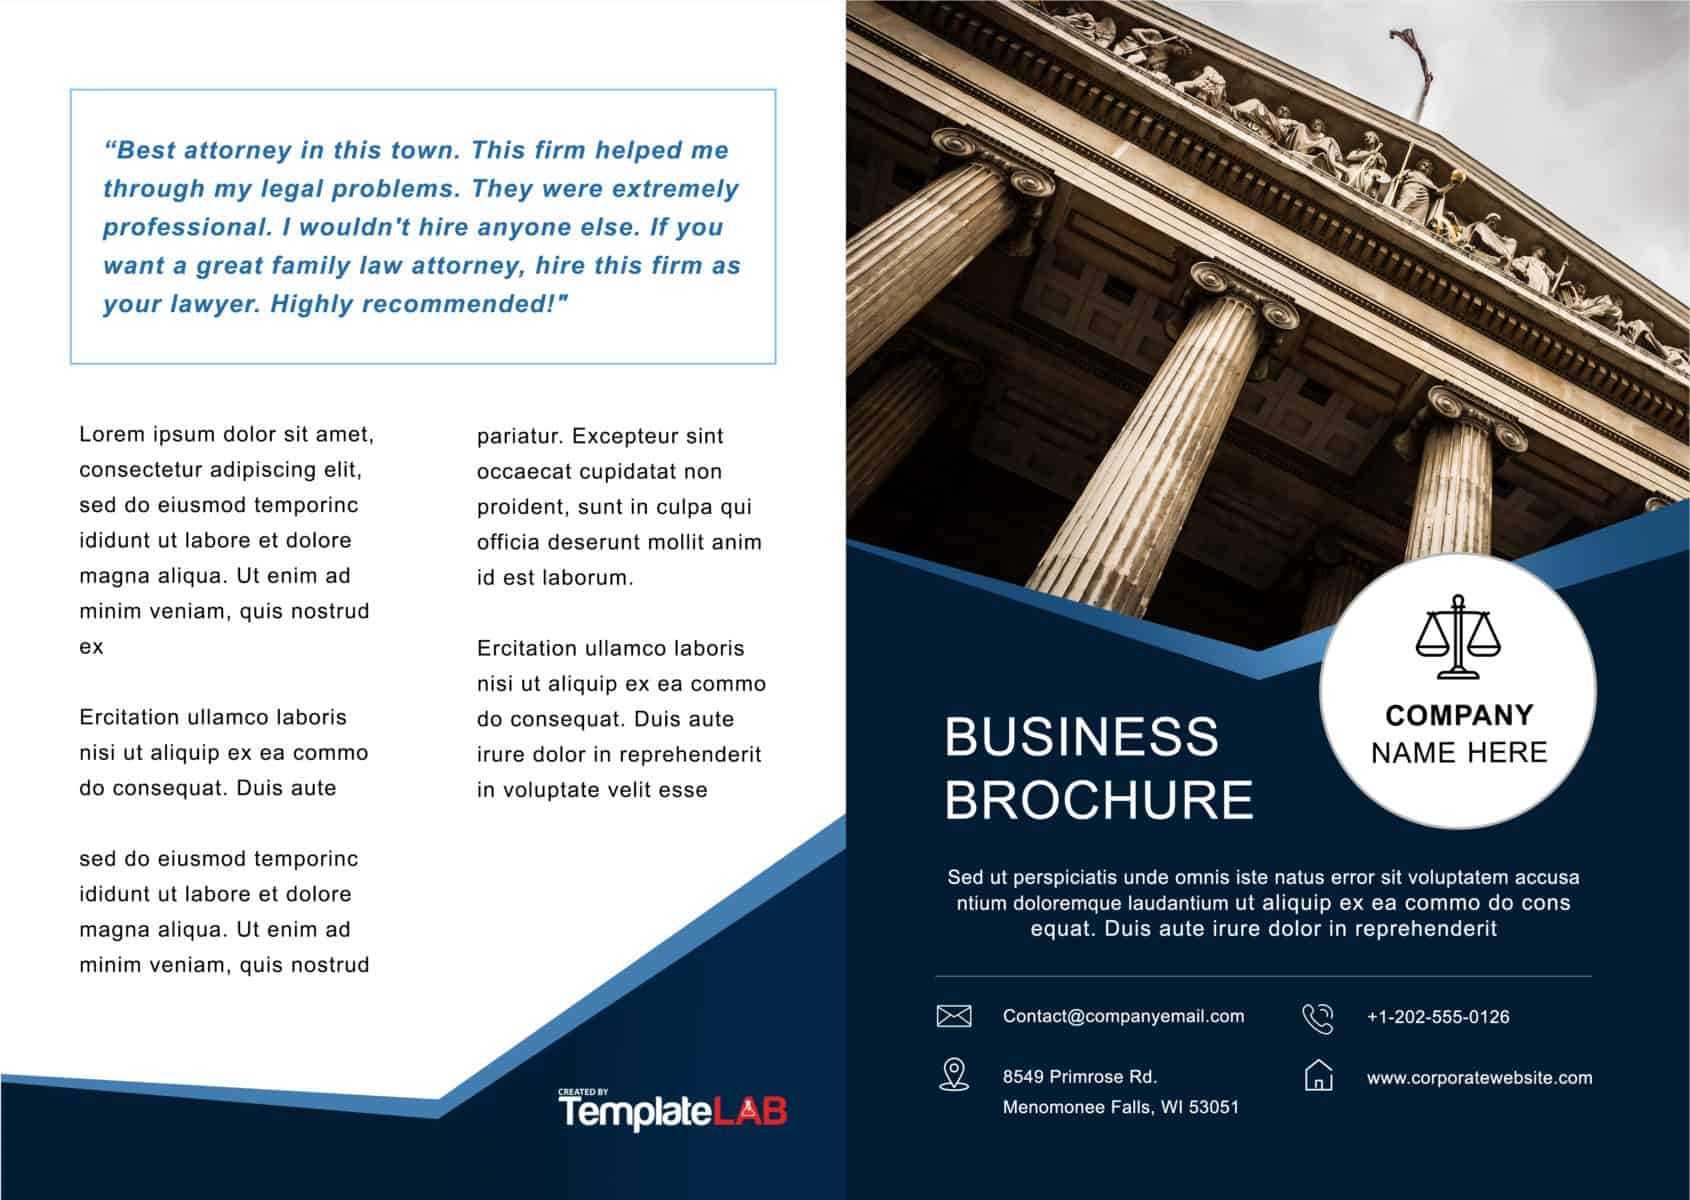 33 Free Brochure Templates (Word + Pdf) ᐅ Templatelab With Microsoft Word Brochure Template Free